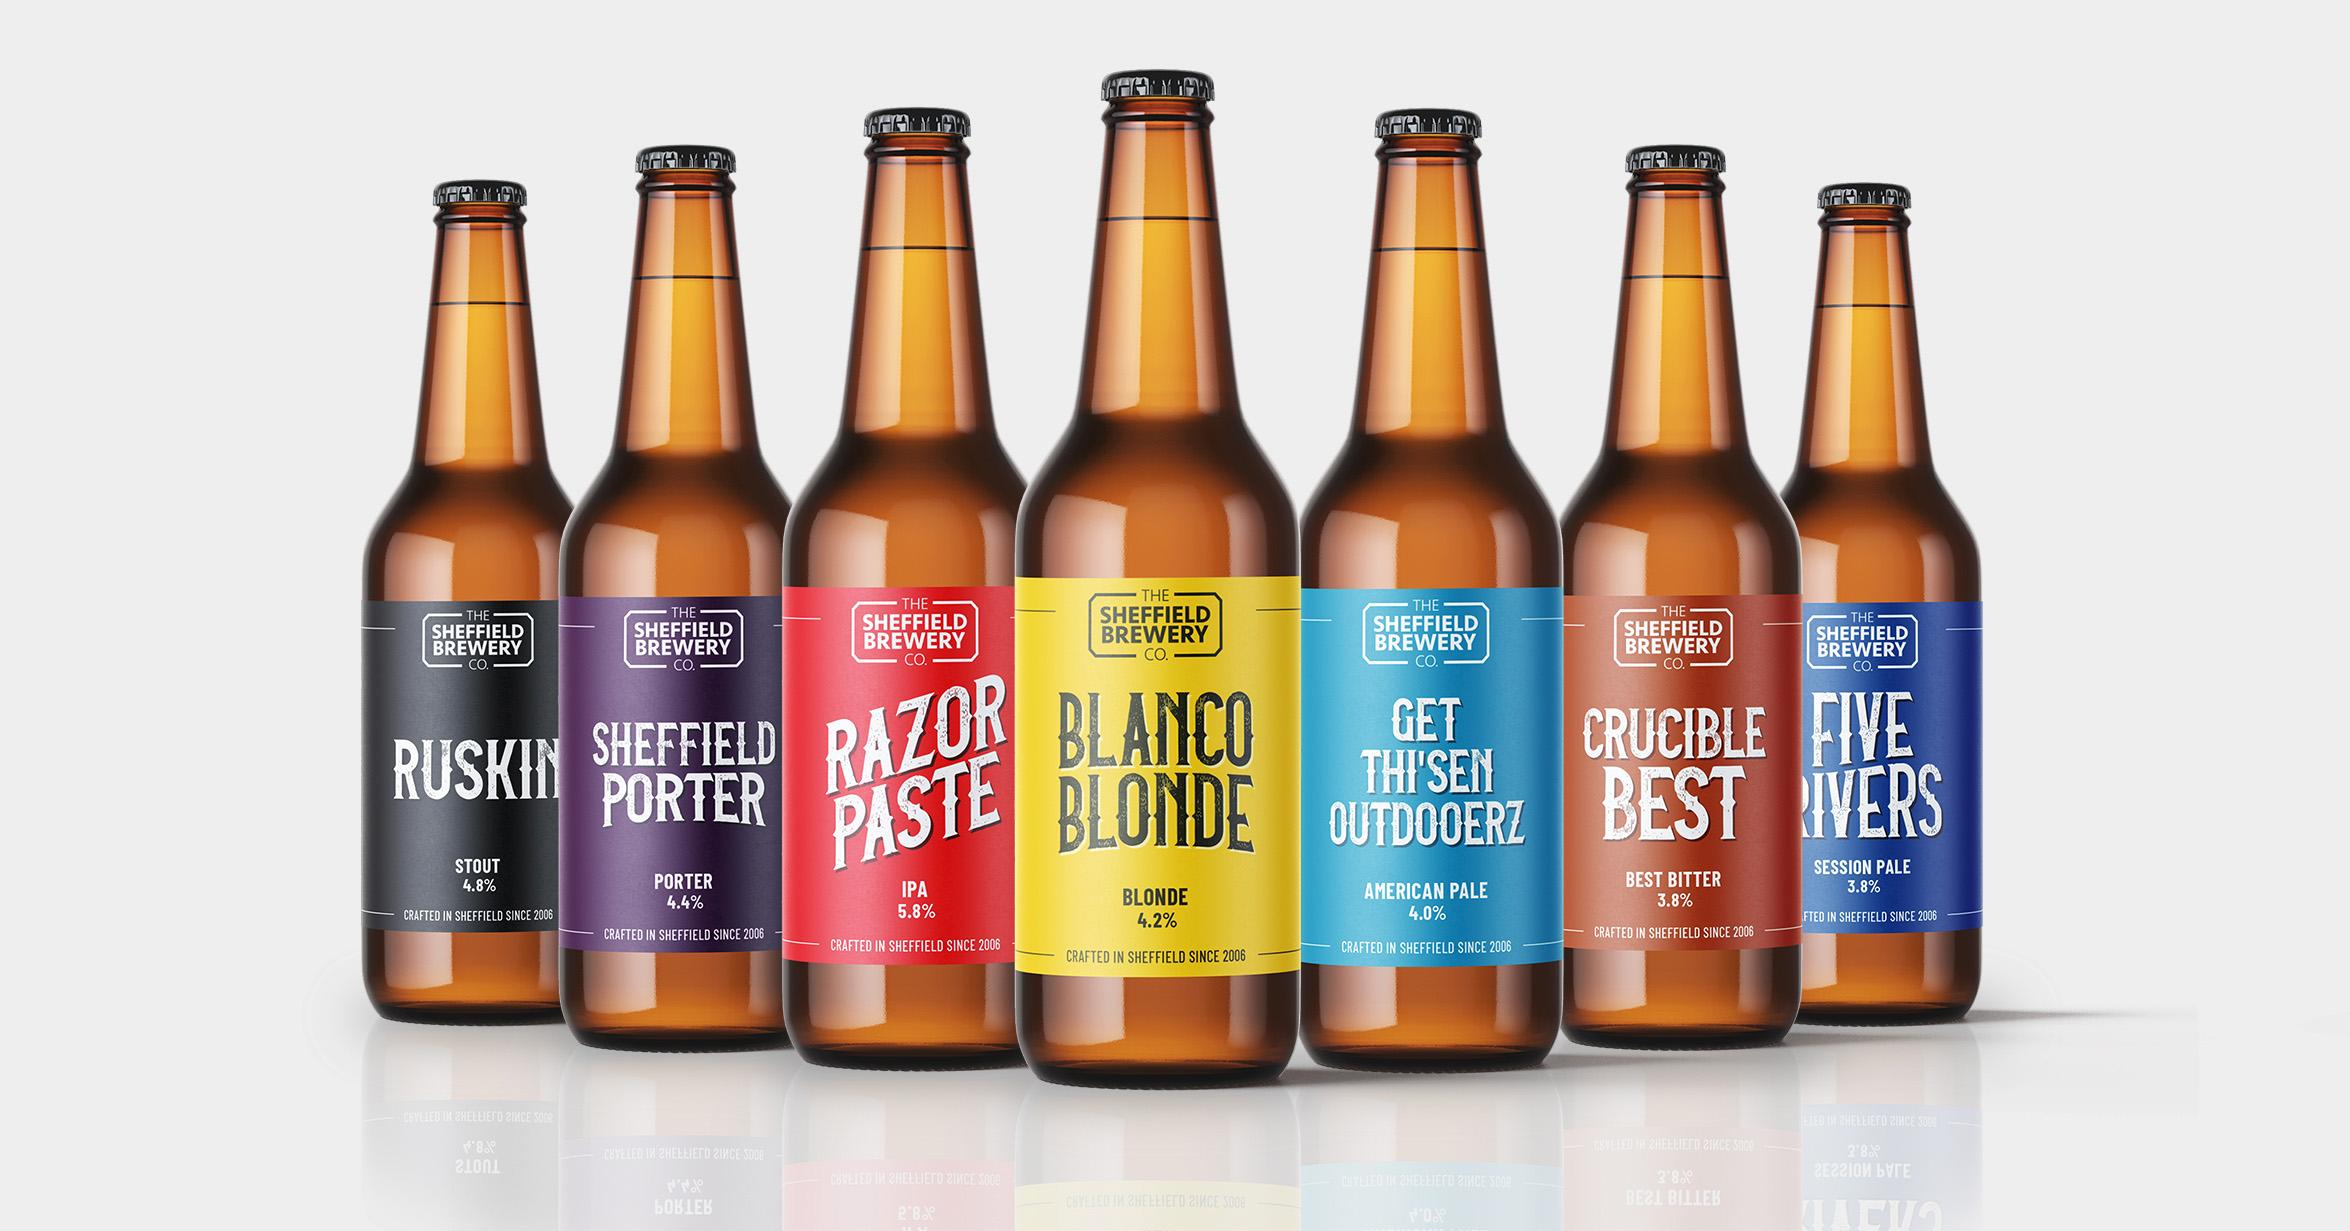 Branding for Sheffield Company - Sheffield Brewery